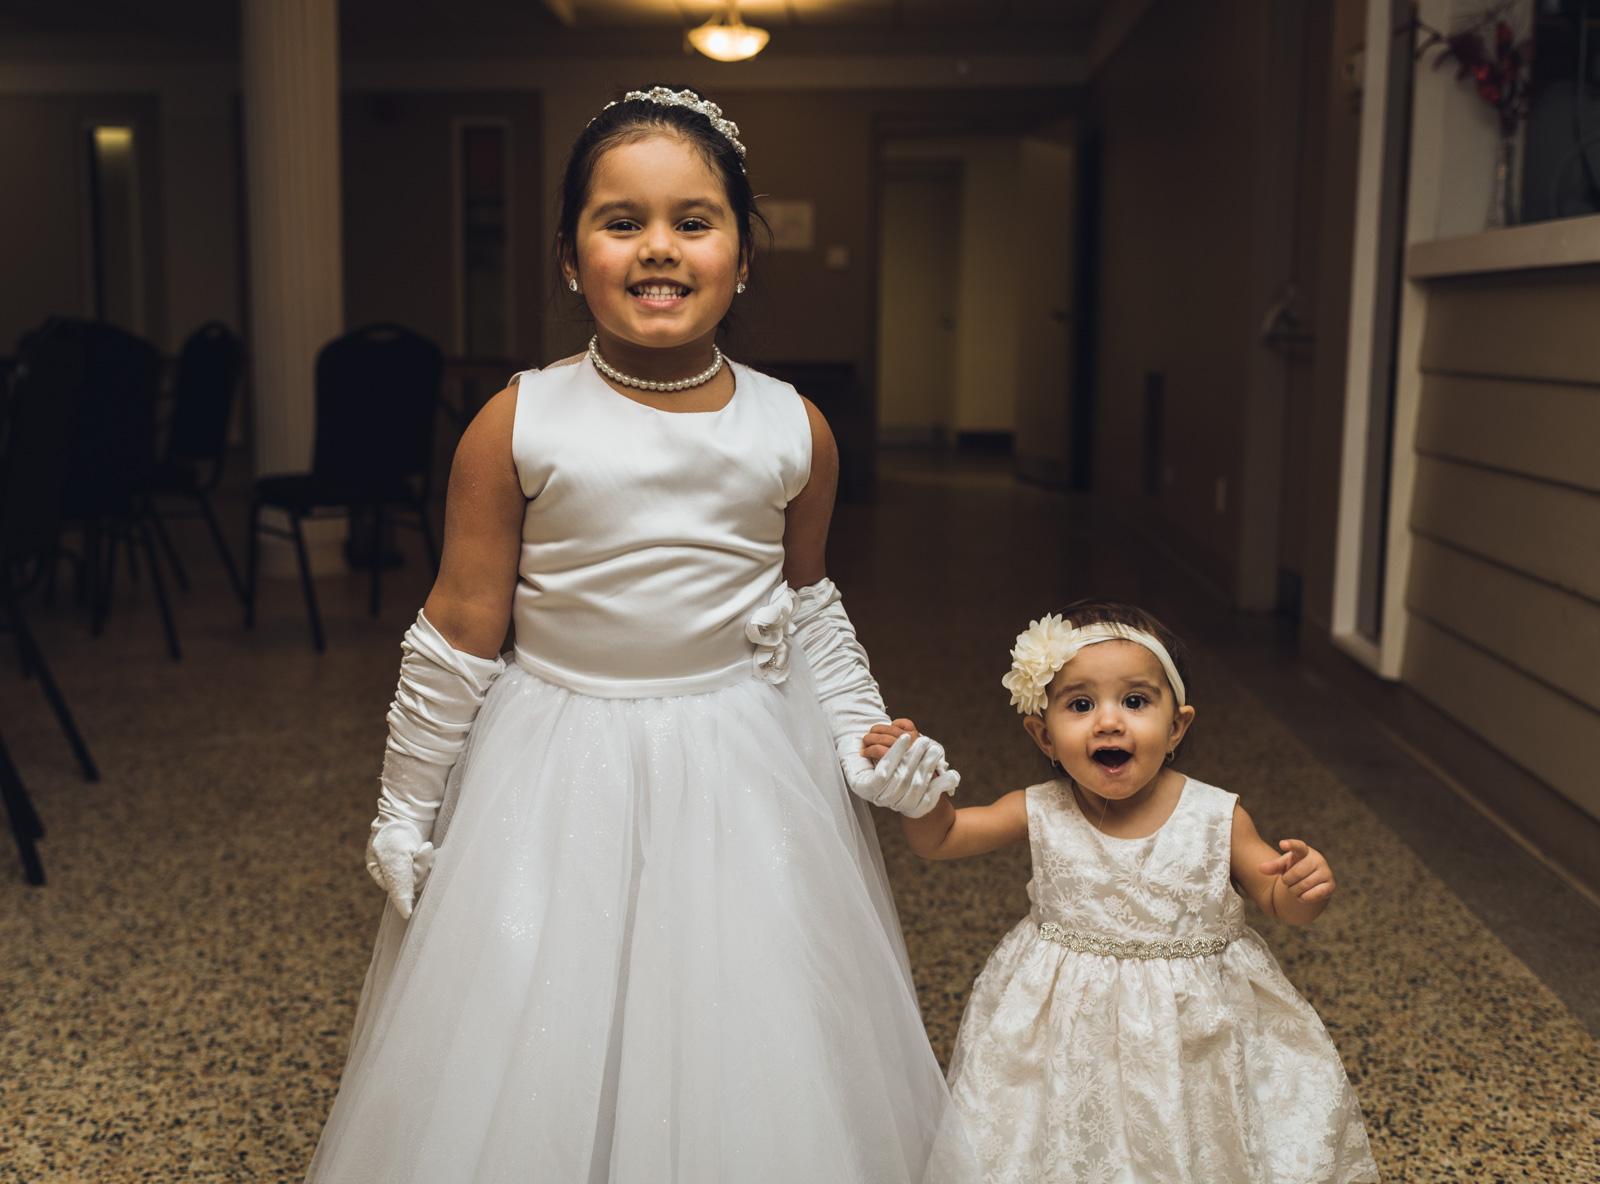 rheana-chris-wedding-blog-184.jpg